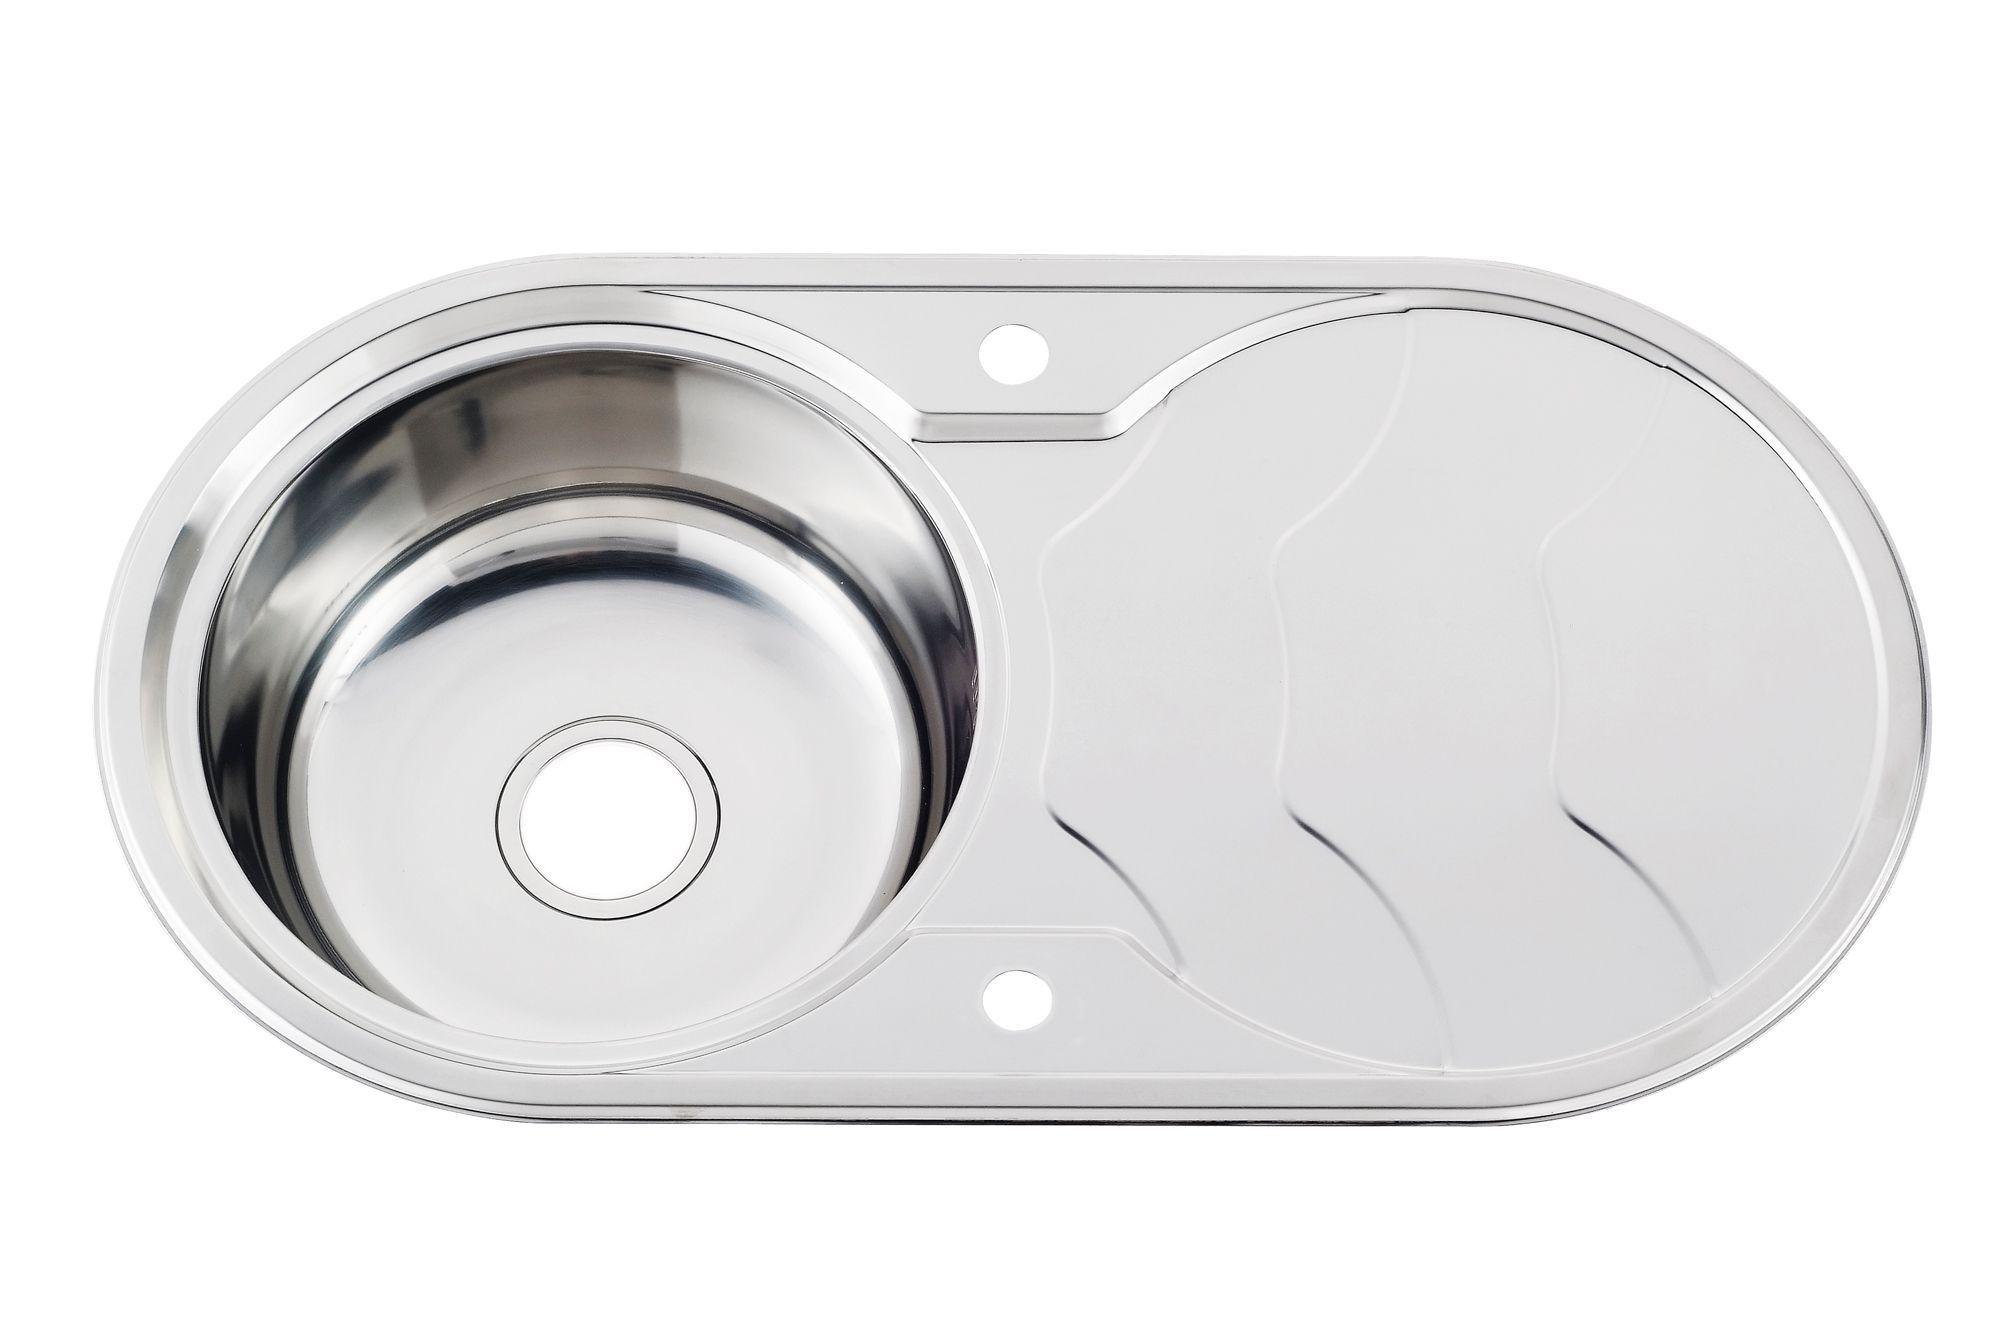 Morgan Morgan 1 Bowl Stainless Steel Sink & Drainer | Departments | DIY at B&Q